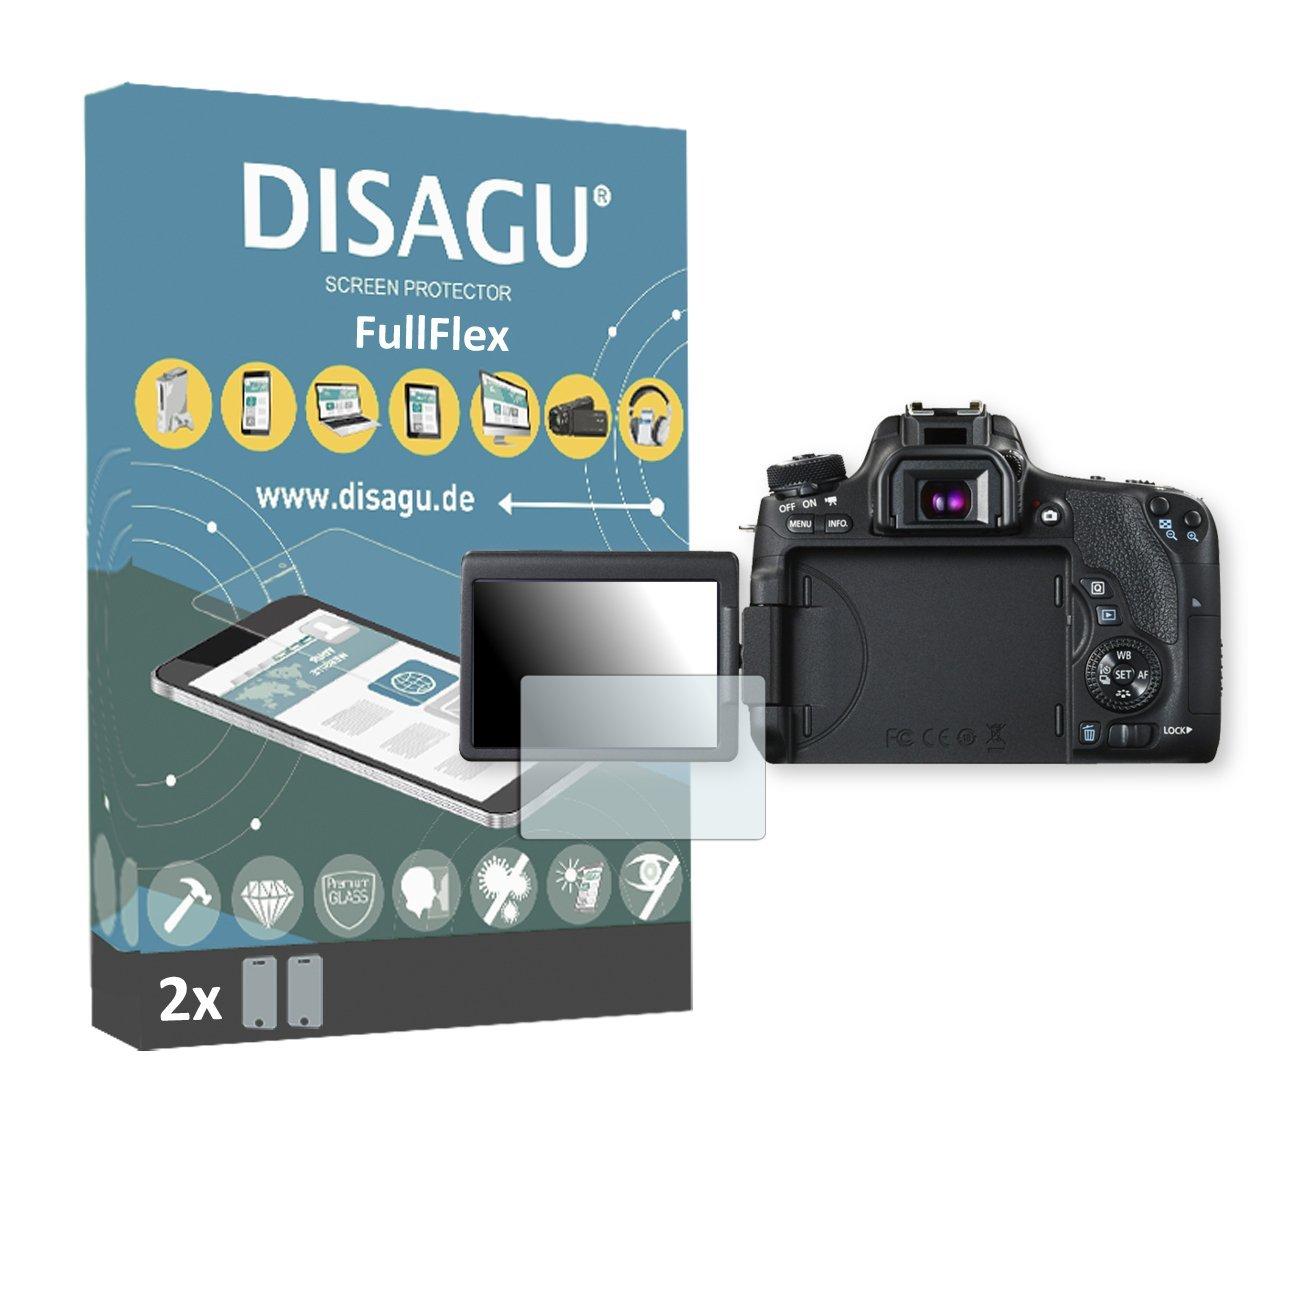 L50 PC 1060 1061 1080F imageCLASS D660 661 680 760 761 780 860 861 880 Toner 5000 Yield OEM Canon 6812A001AA OEM Toner